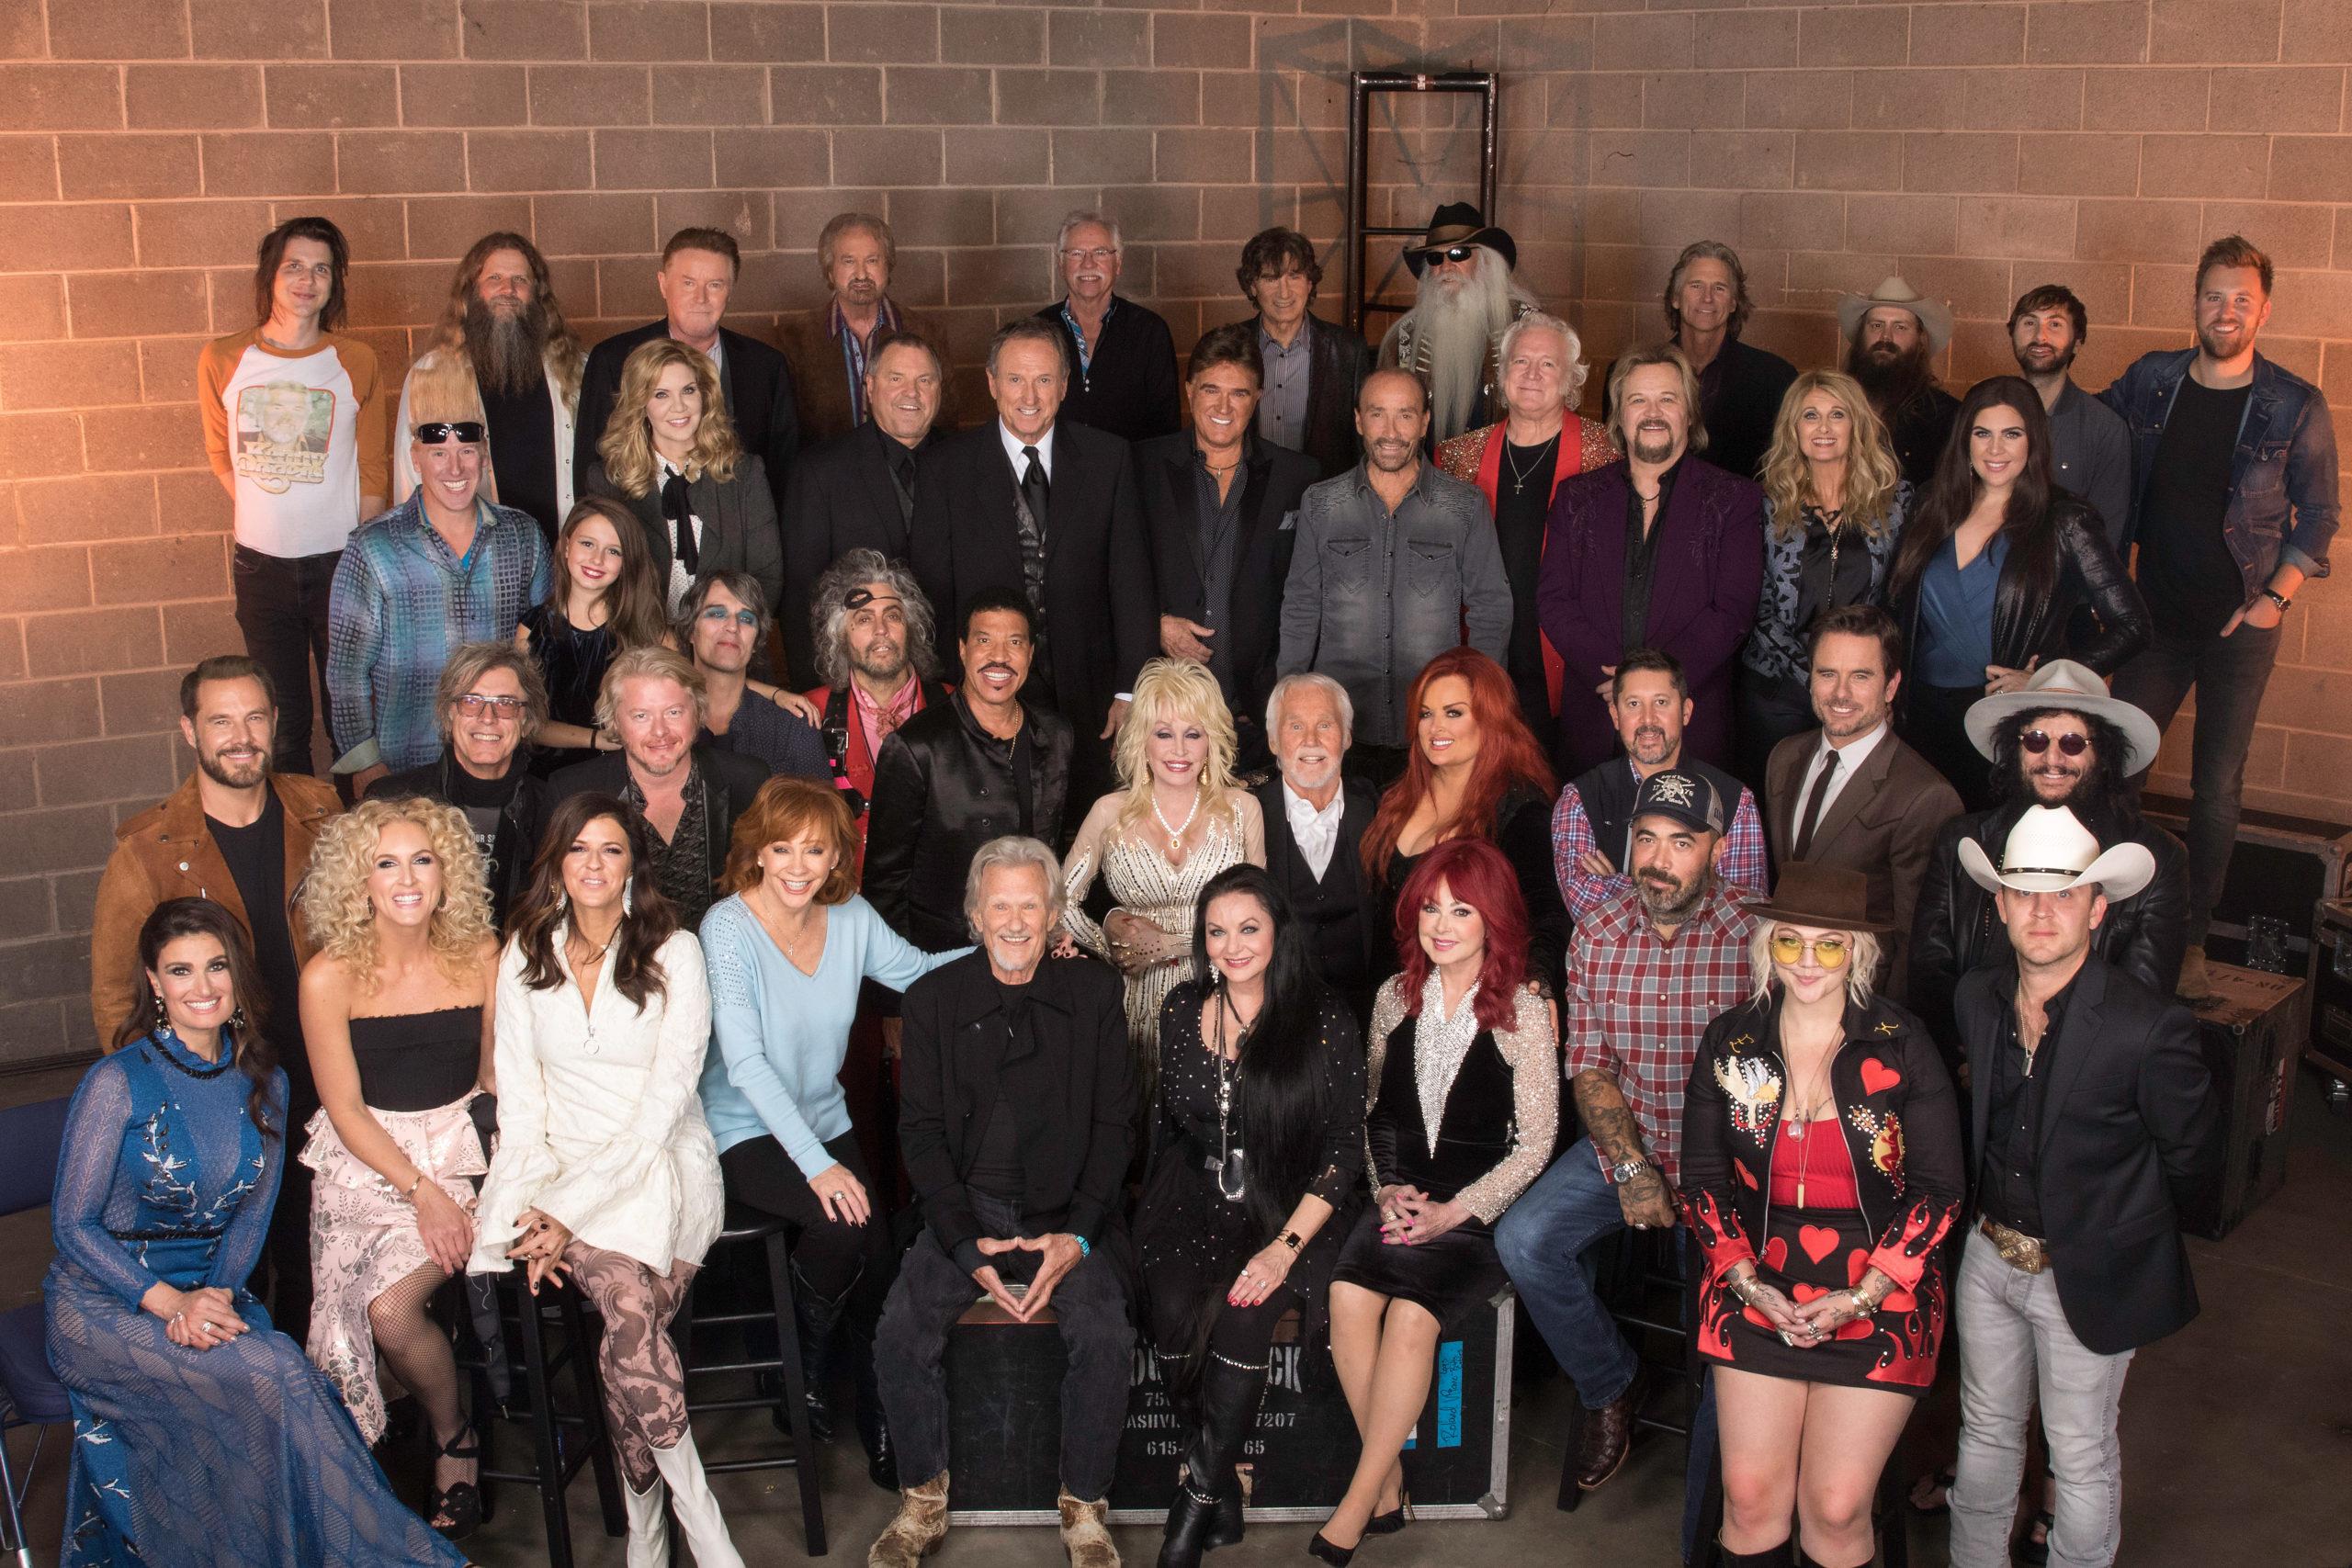 Kenny Rogers Celebrates Memories Last Night At Farewell Celebration